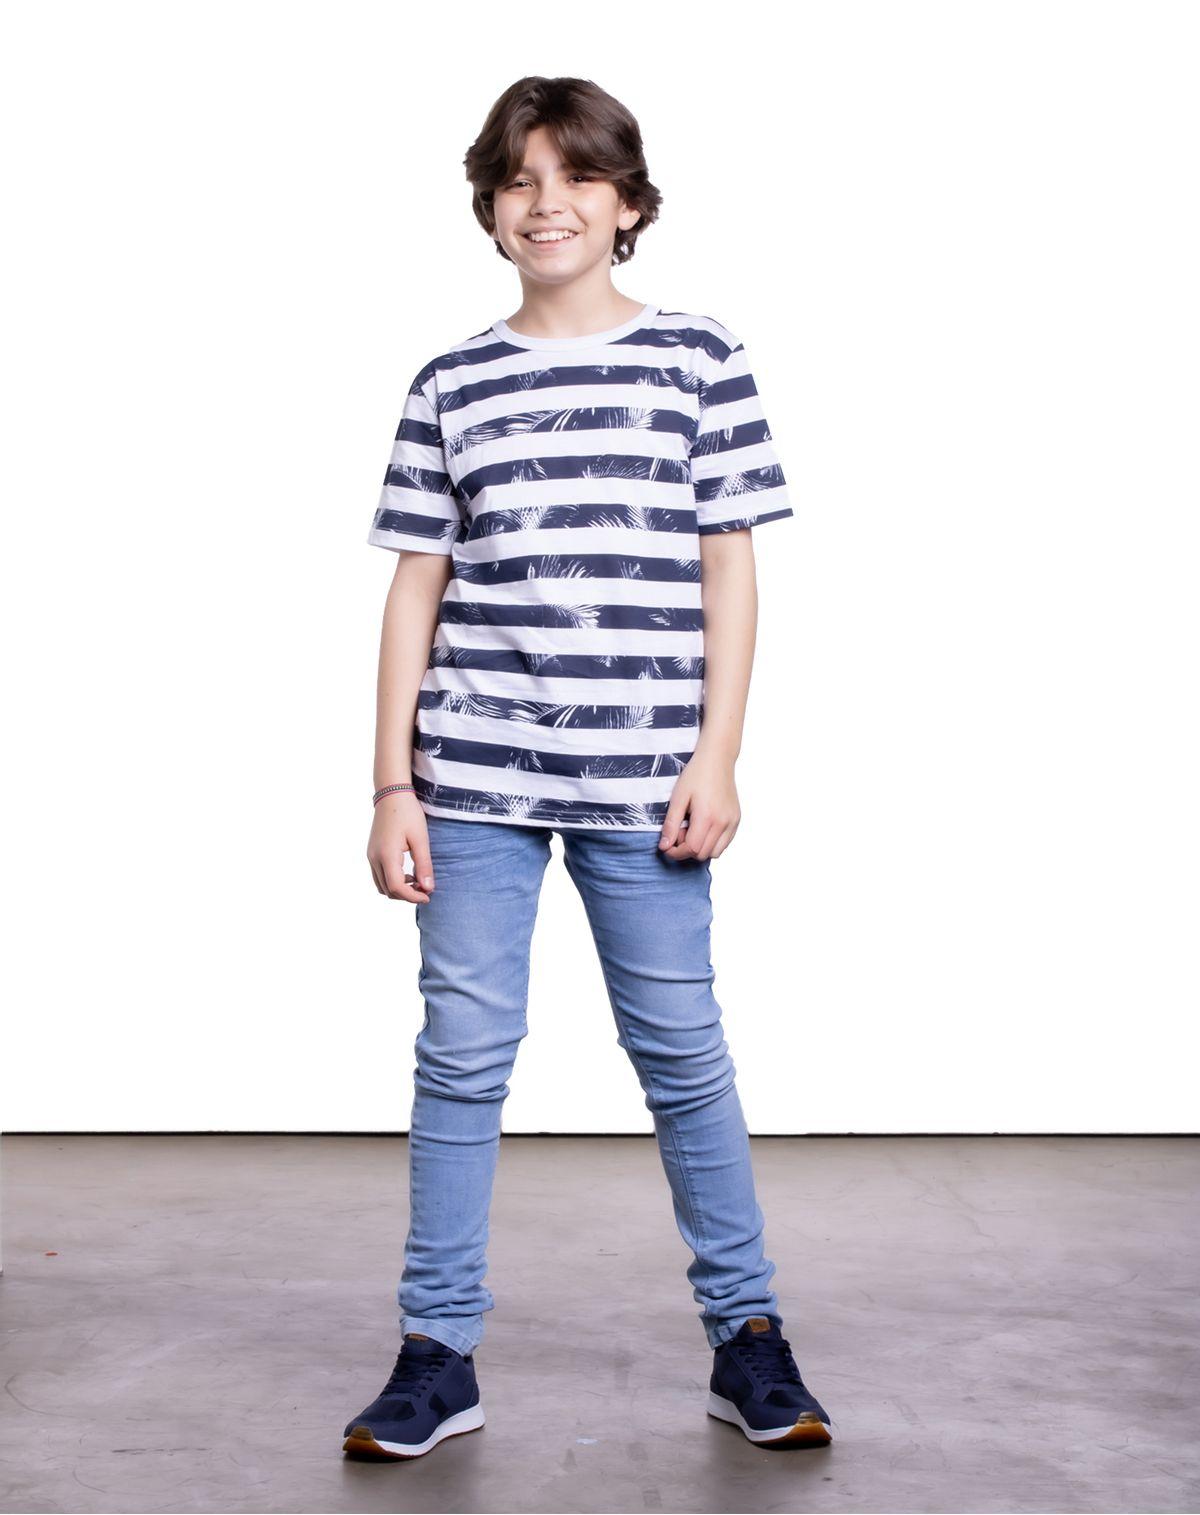 588580003-calca-jeans-claro-skinny-juvenil-menino-bolsos-jeans-14-d1b